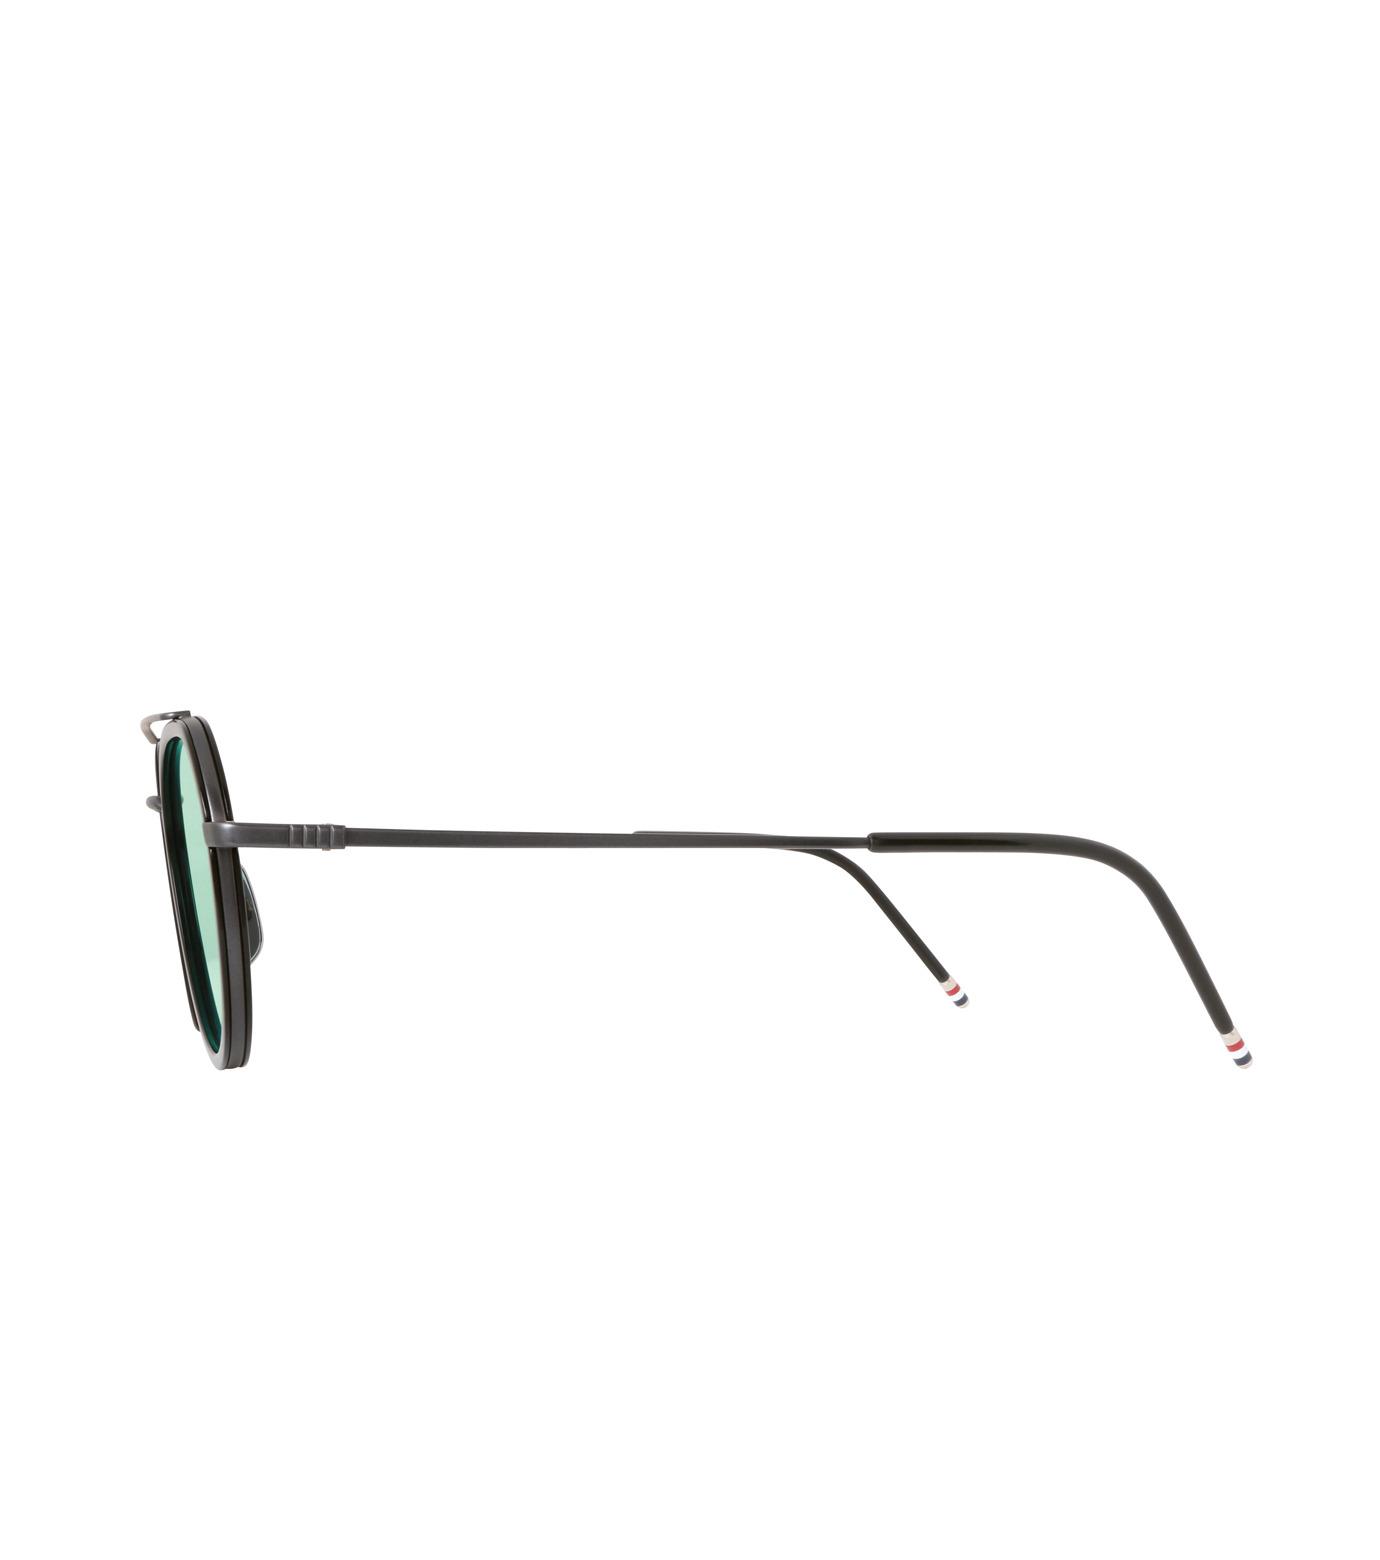 Thom Browne Eye Wear(トム・ブラウン・アイウェア)のMirror Lens Teardrop-BLACK(アイウェア/eyewear)-TB-801-F-13 拡大詳細画像2